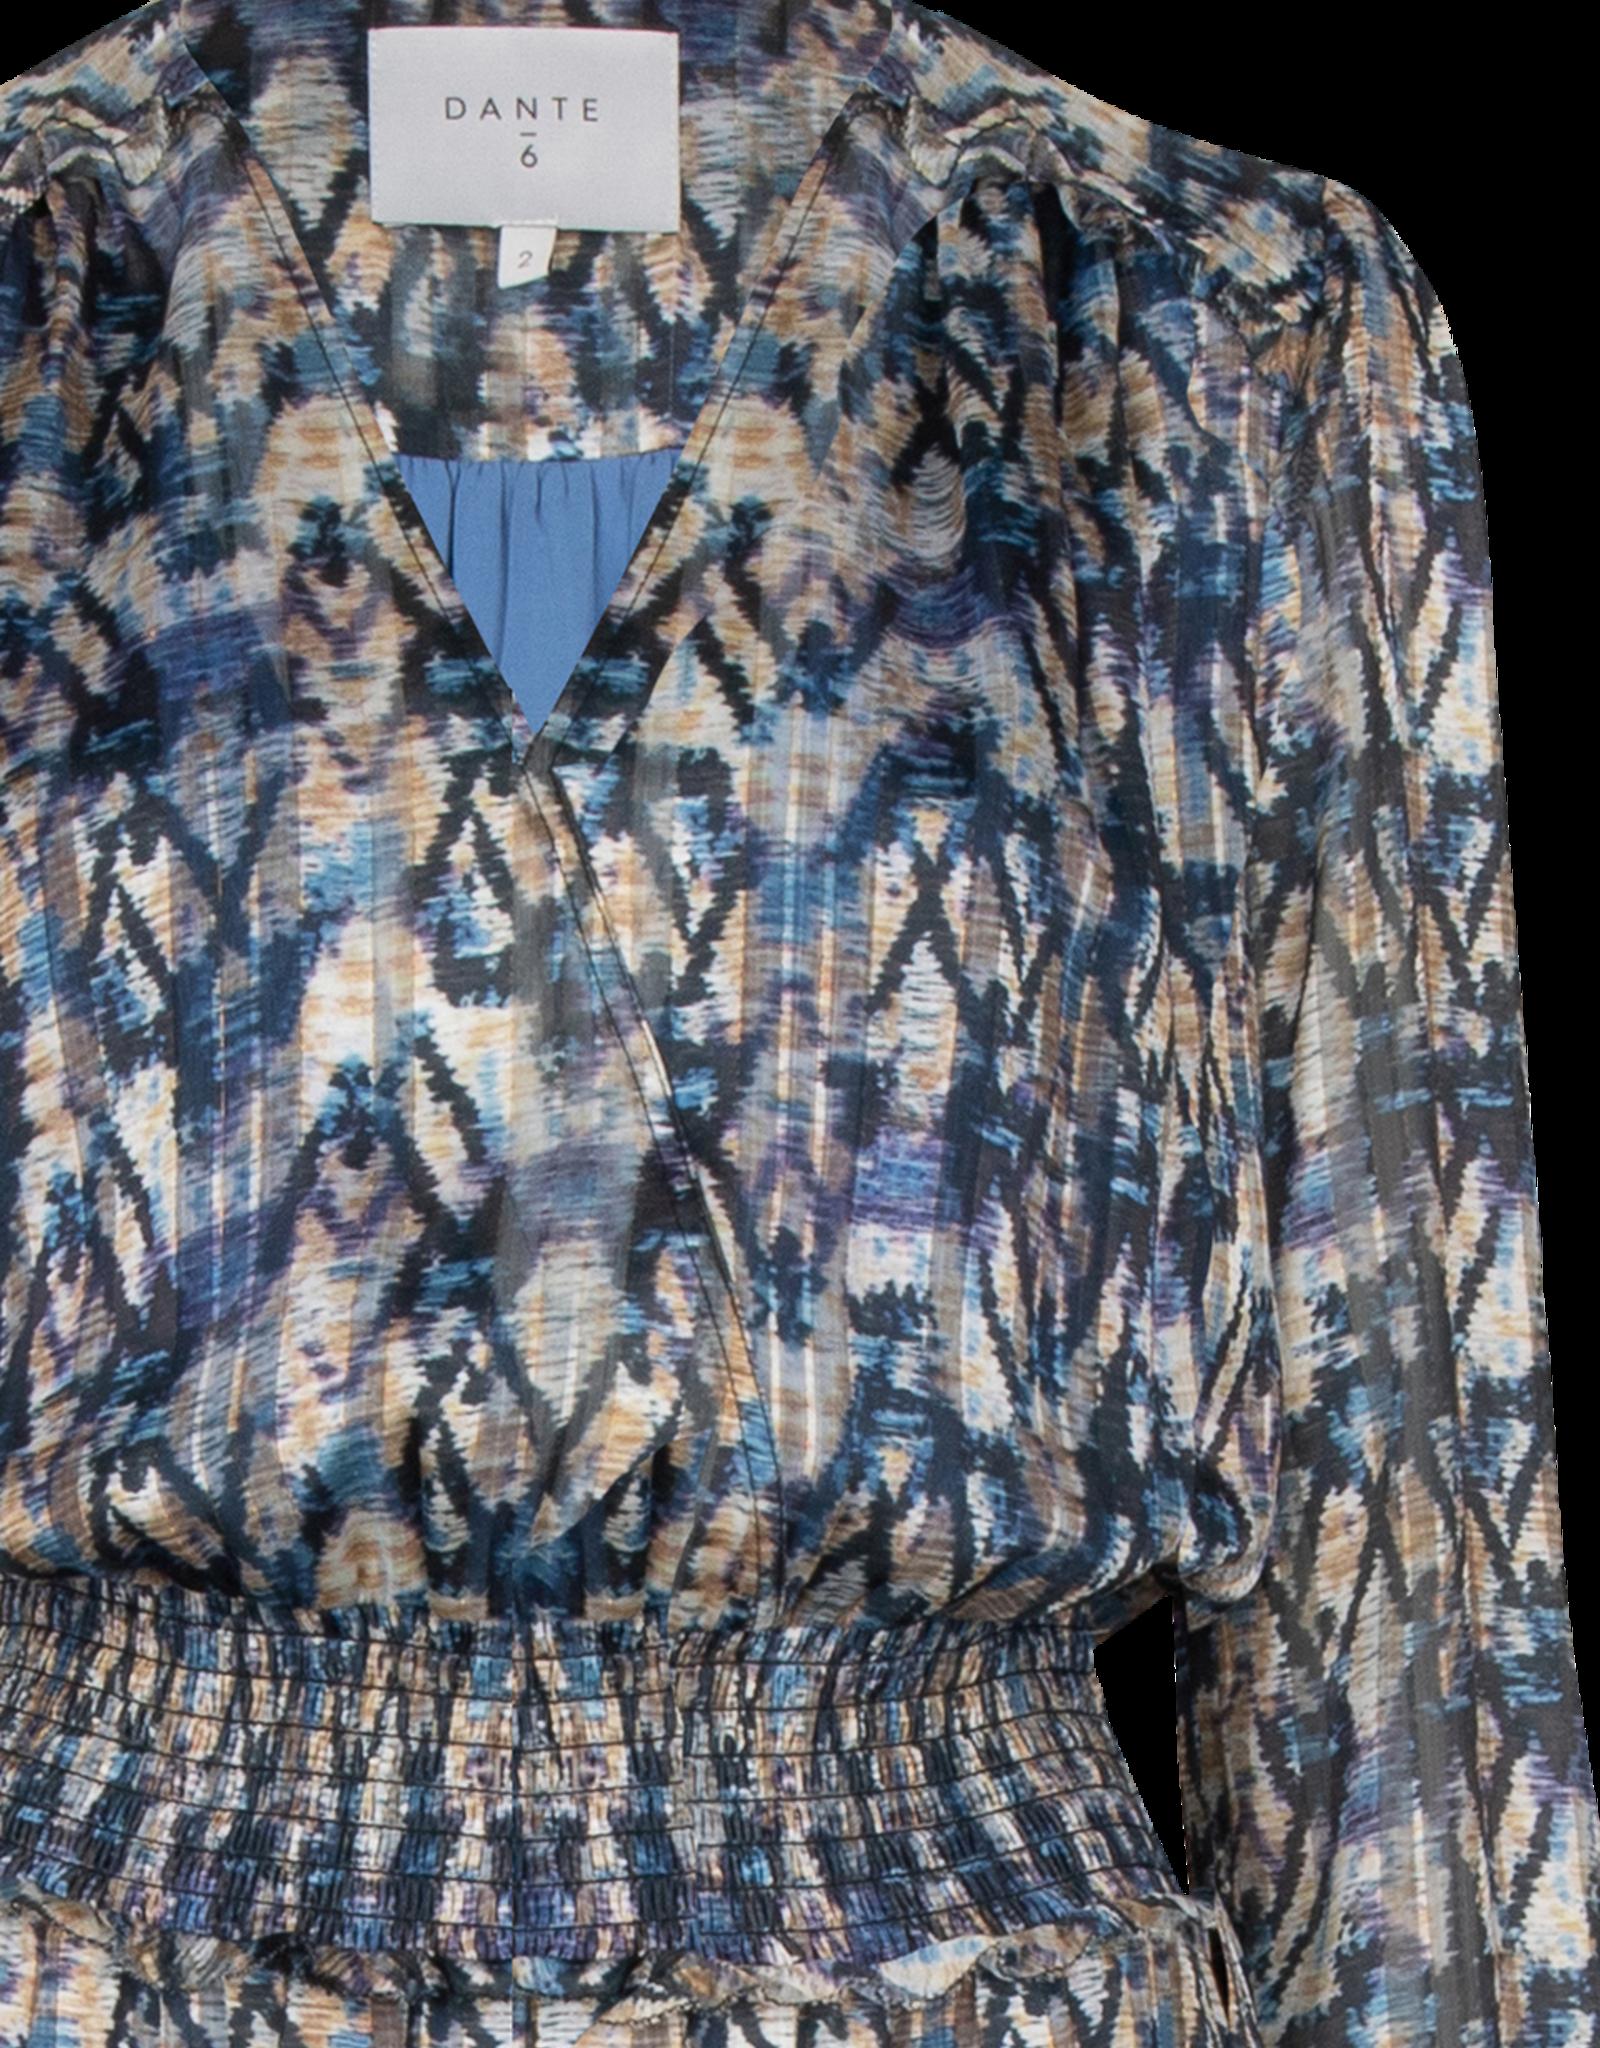 Dante 6 Bardon Aztec Print Long Dress Multi